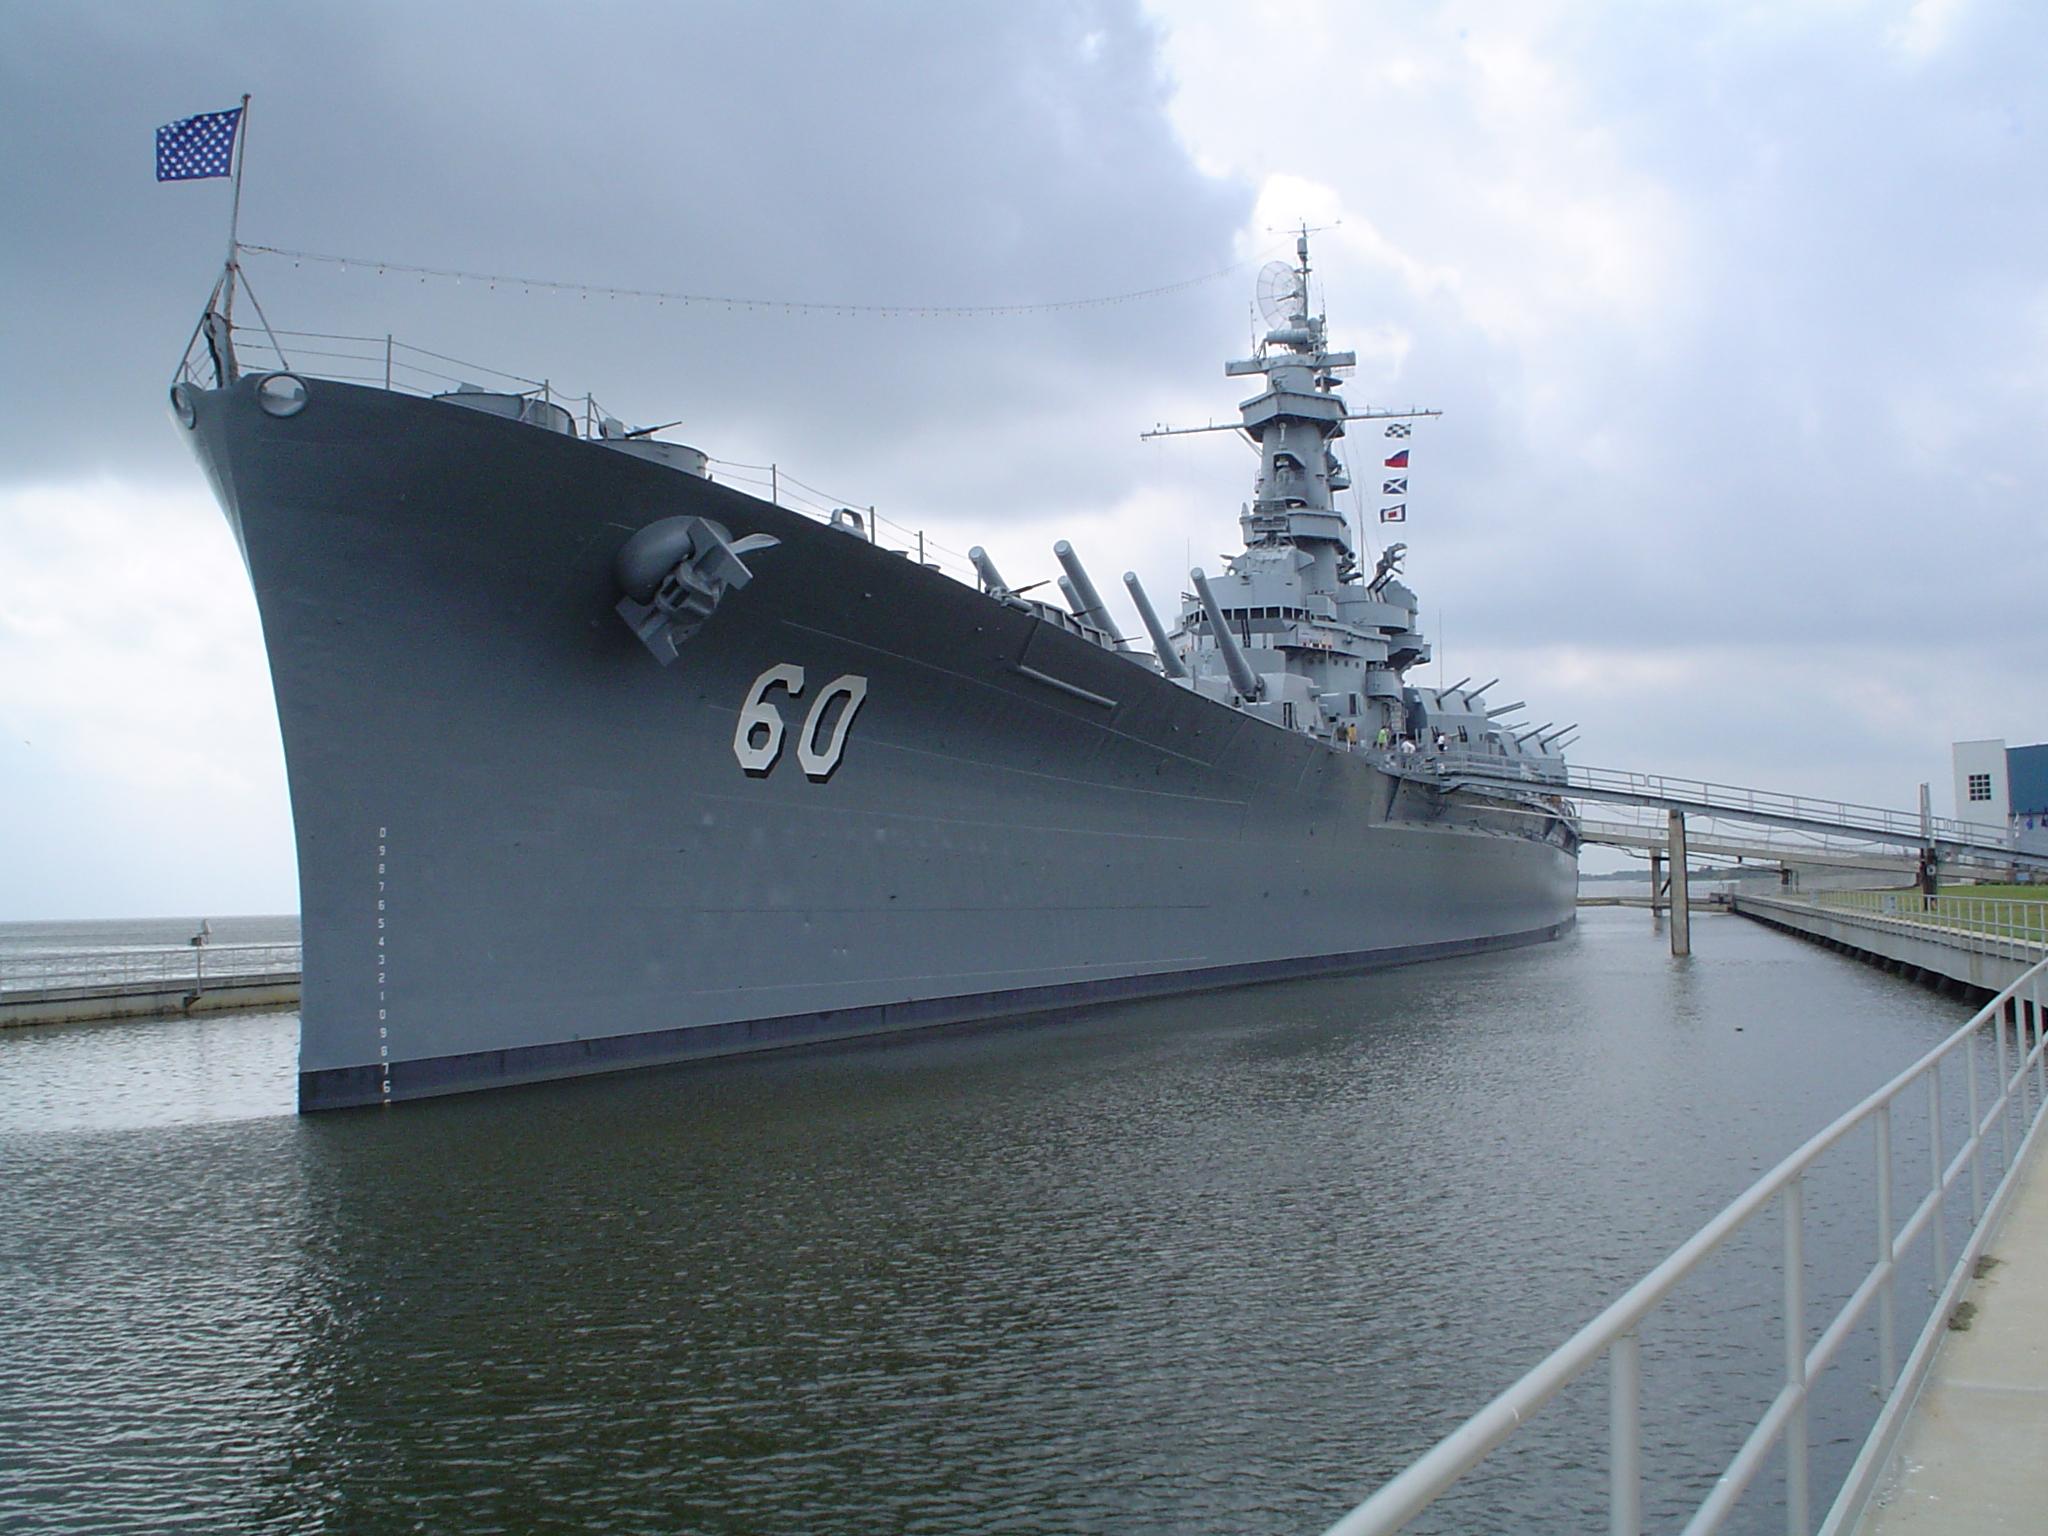 File:USS Alabama Mobile, Alabama 002.JPG